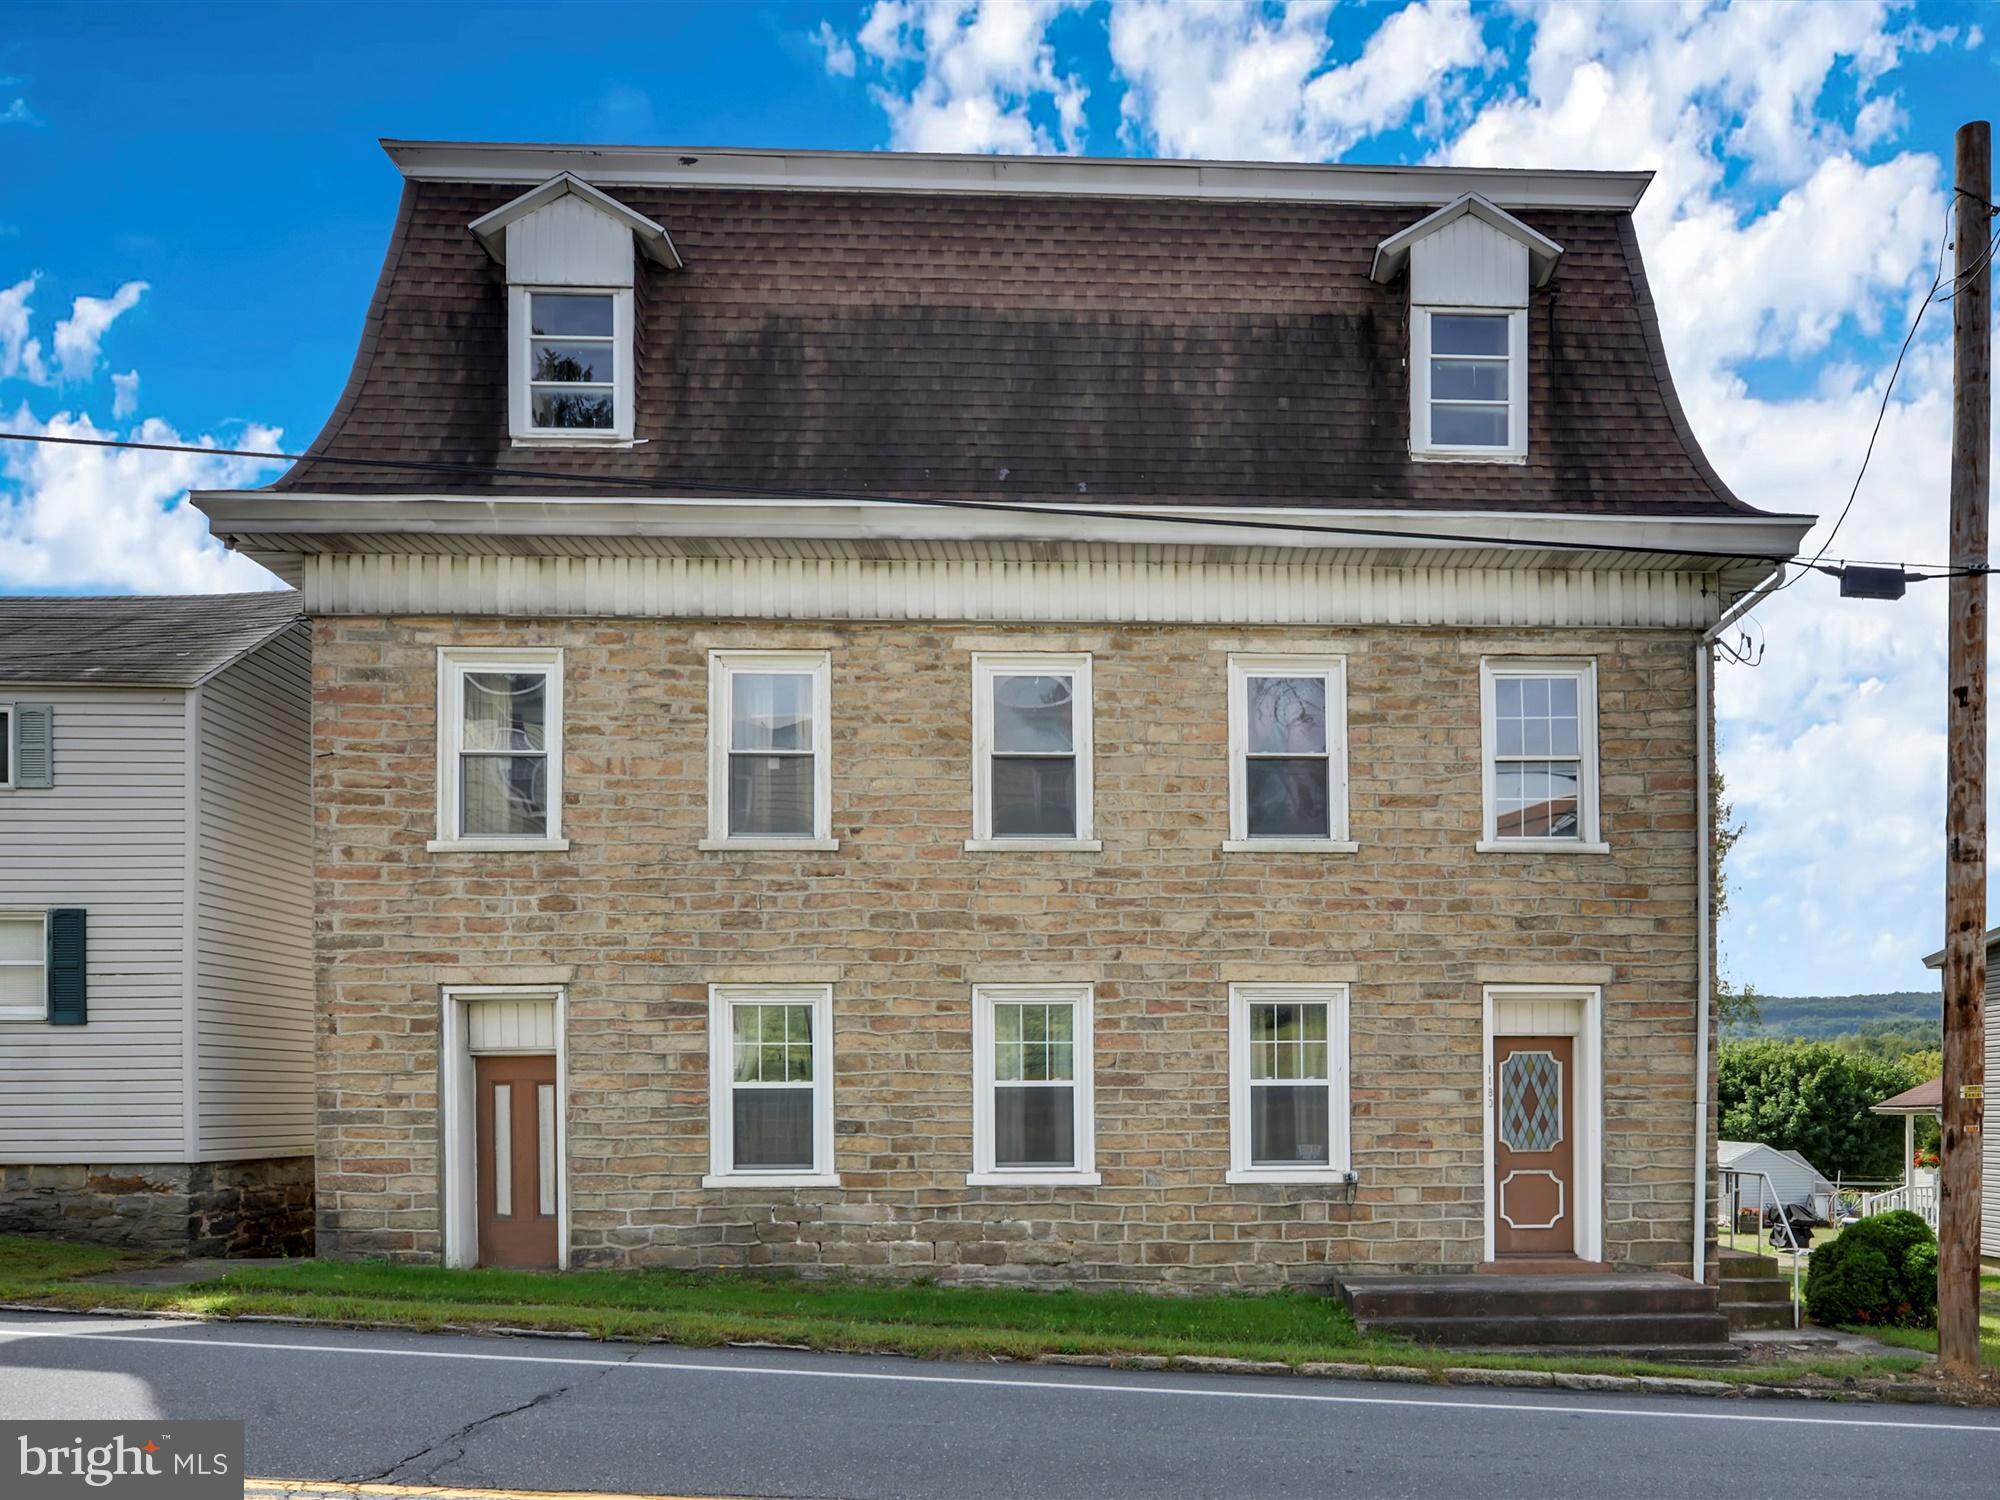 1180 BUNTING STREET, LLEWELLYN, PA 17944